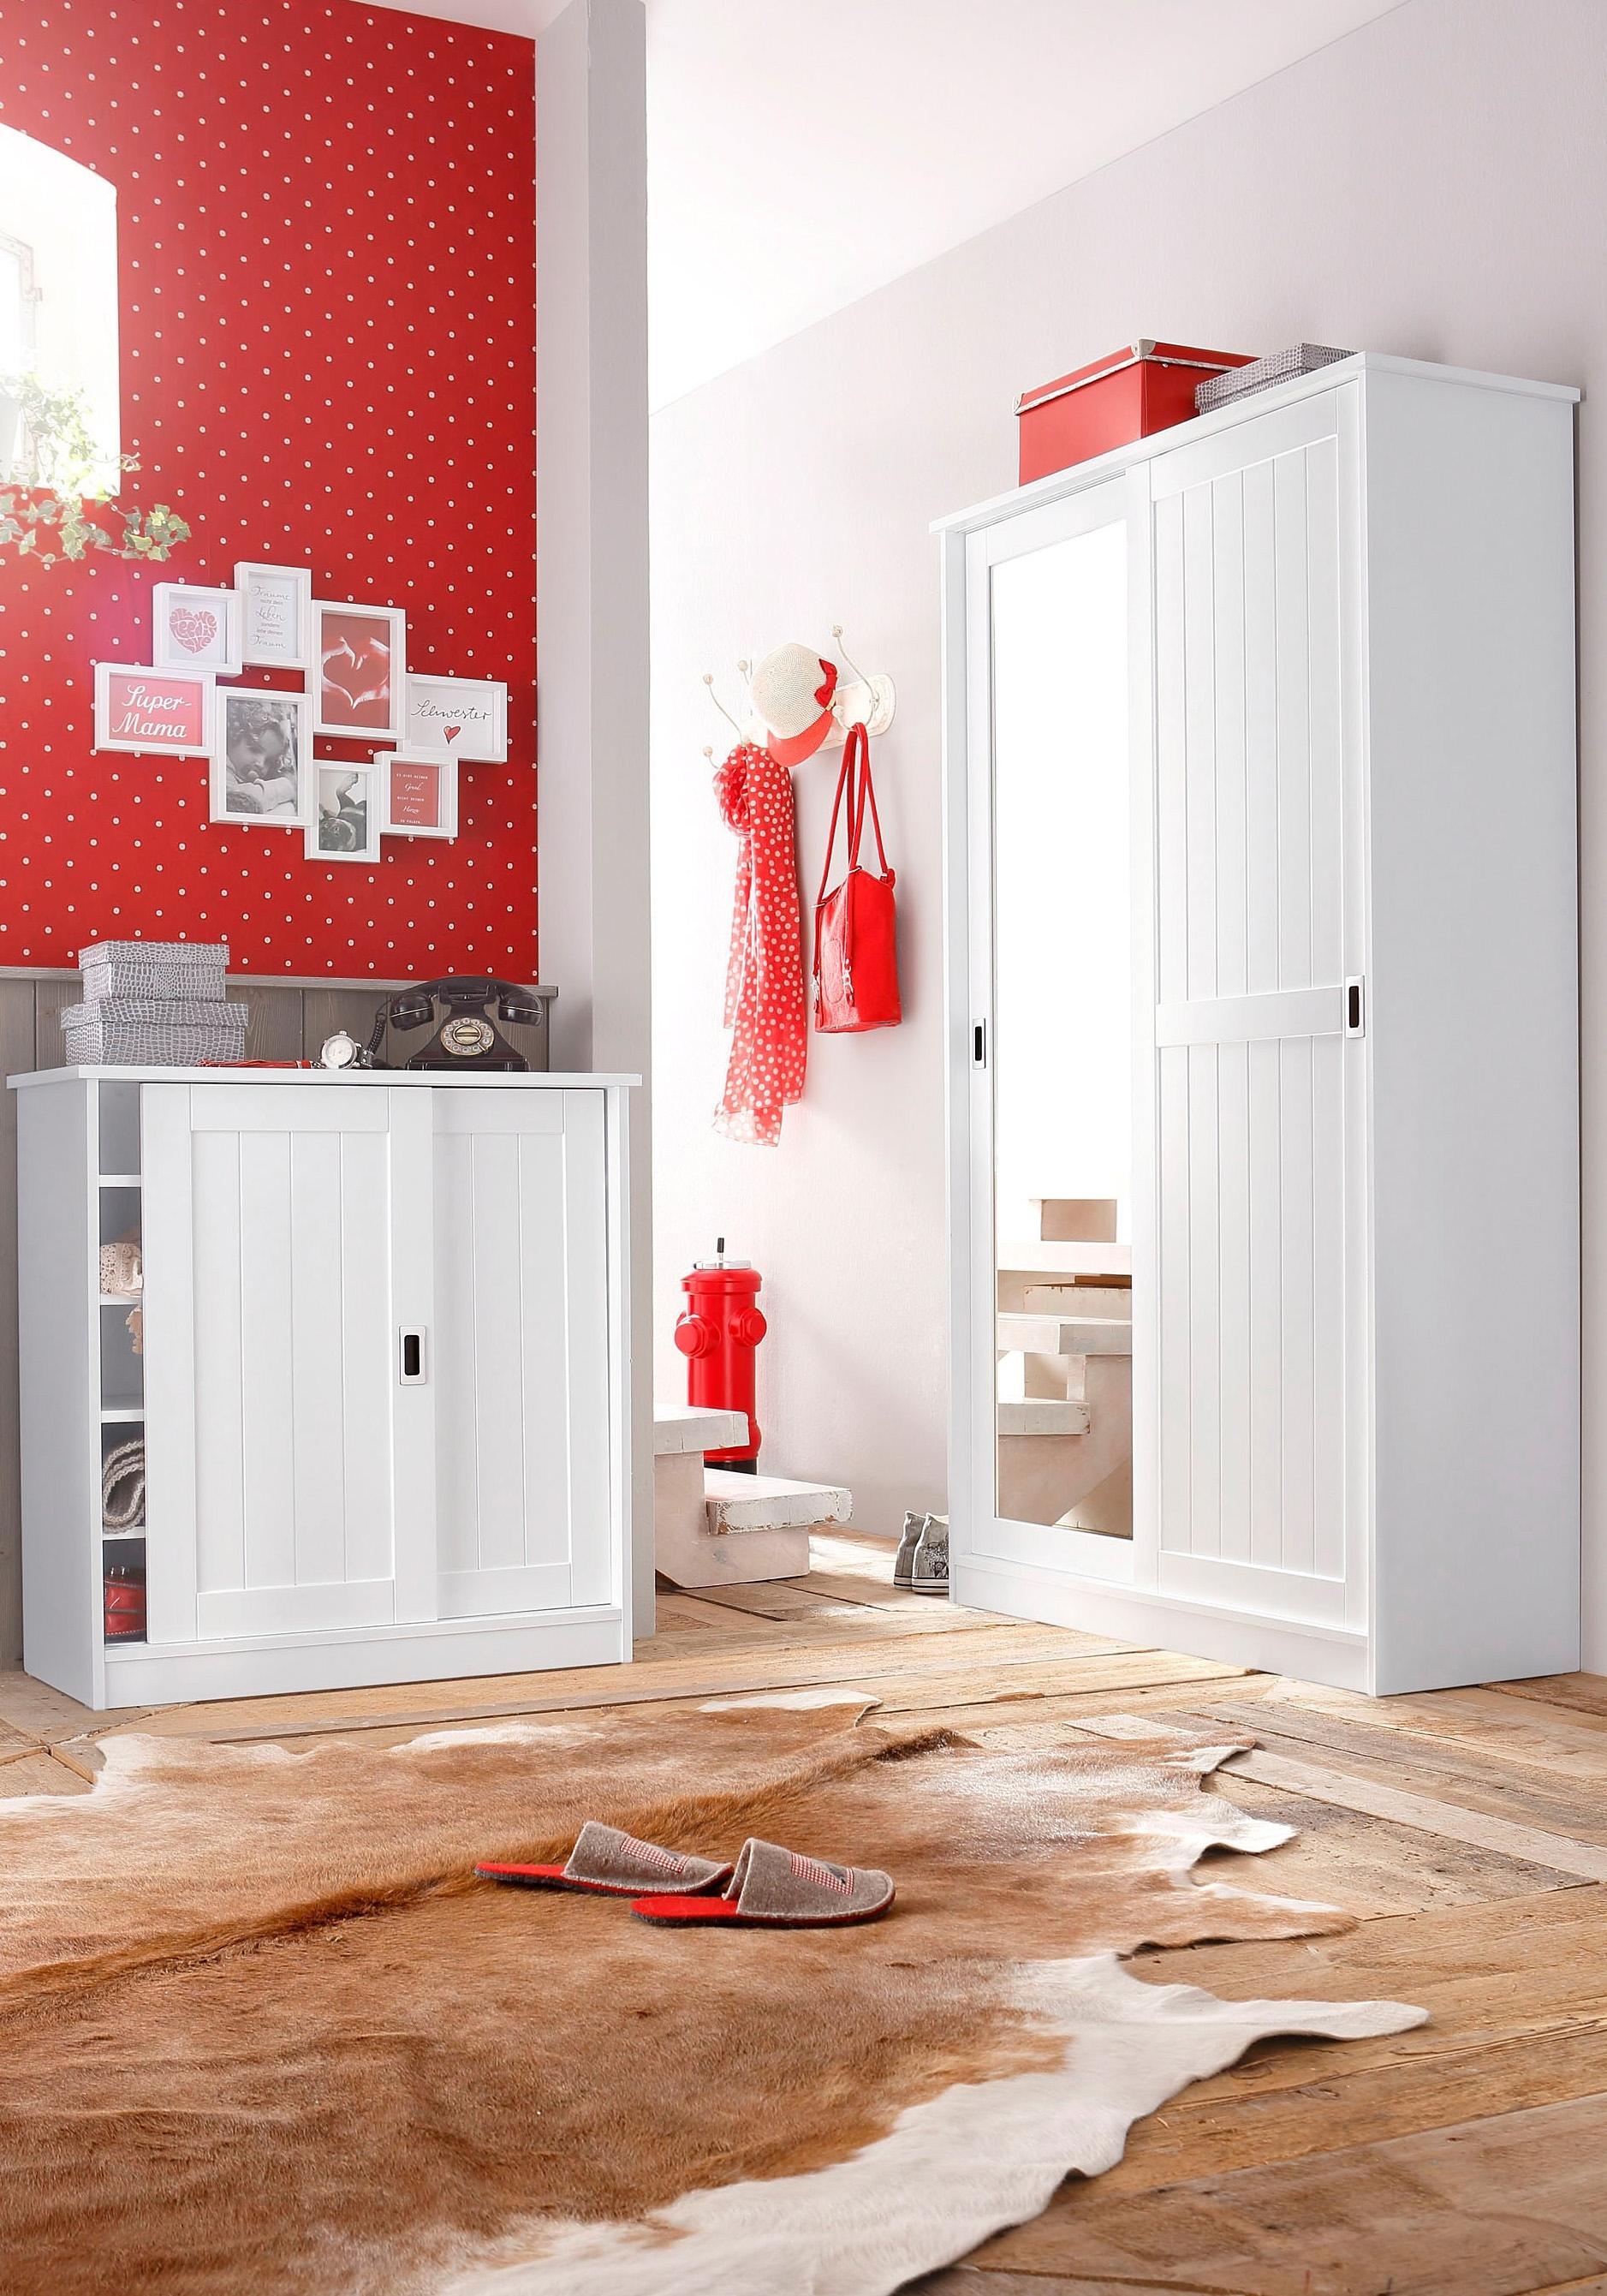 home affaire schoenenkast in moderne landhuisstijl online shoppen otto. Black Bedroom Furniture Sets. Home Design Ideas